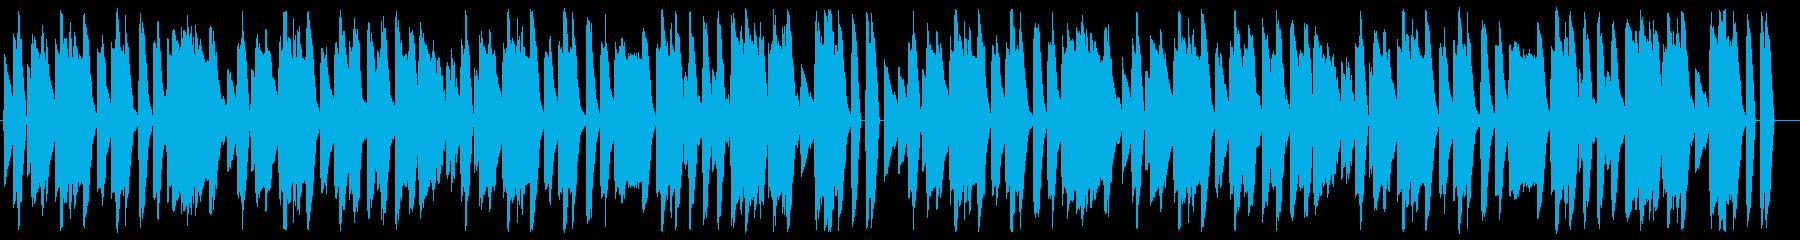 Mario-style fun 8-bit NES BGM's reproduced waveform